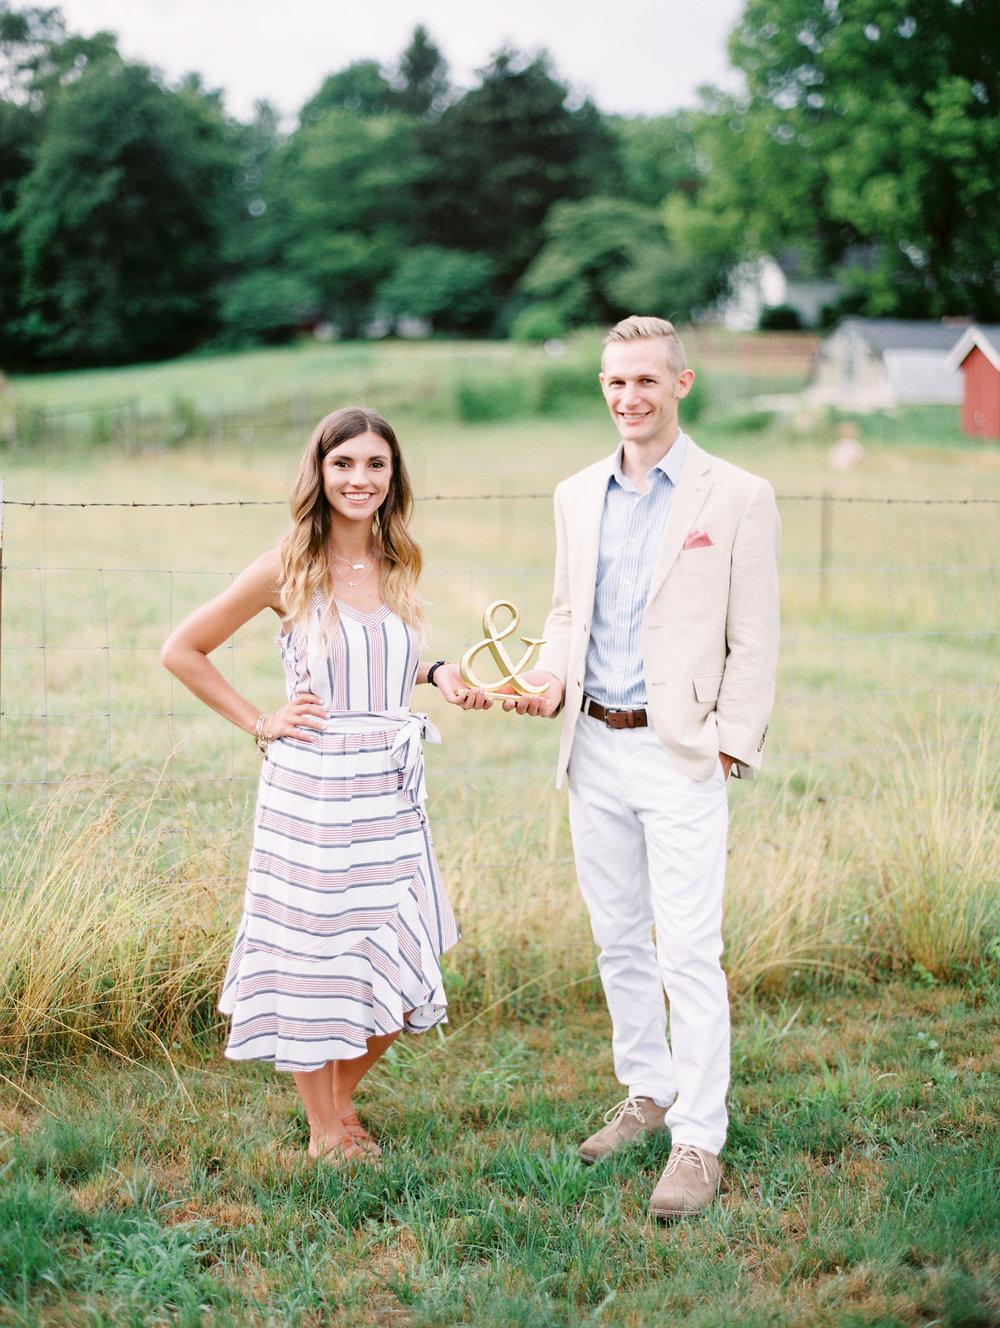 Kerri+Austin+Lavender+Field+Engagement-11.jpg